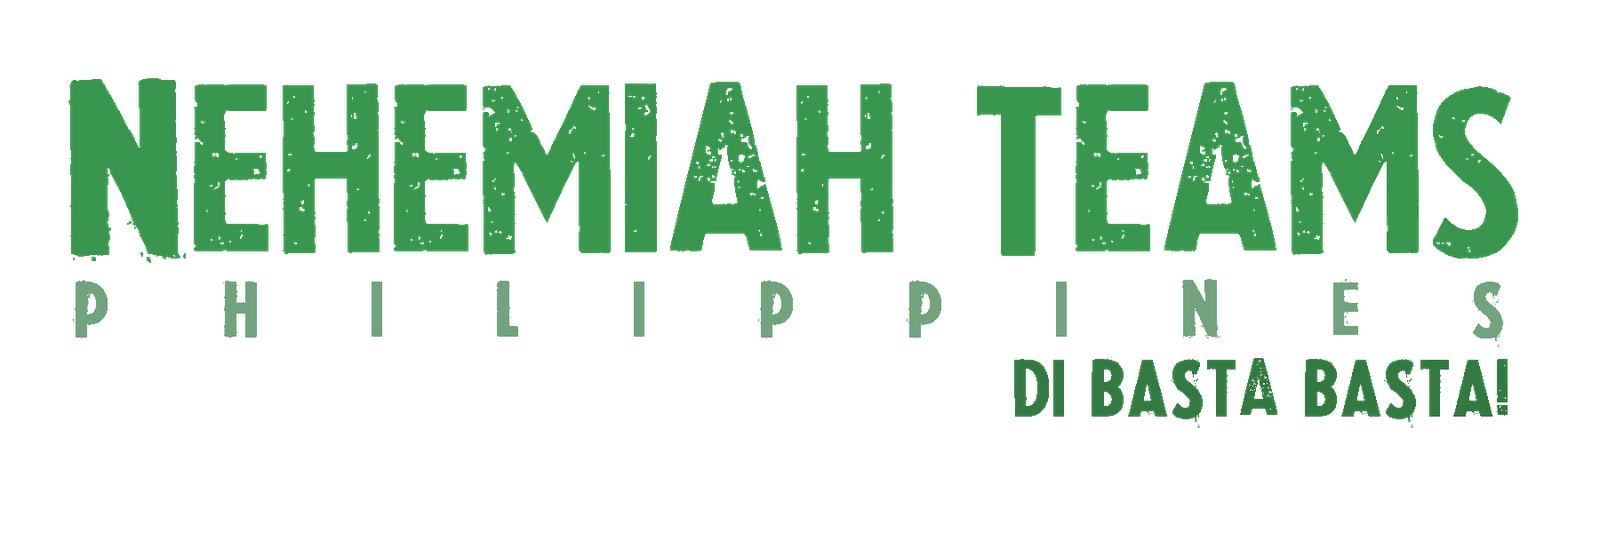 NehemiahTeamsPH